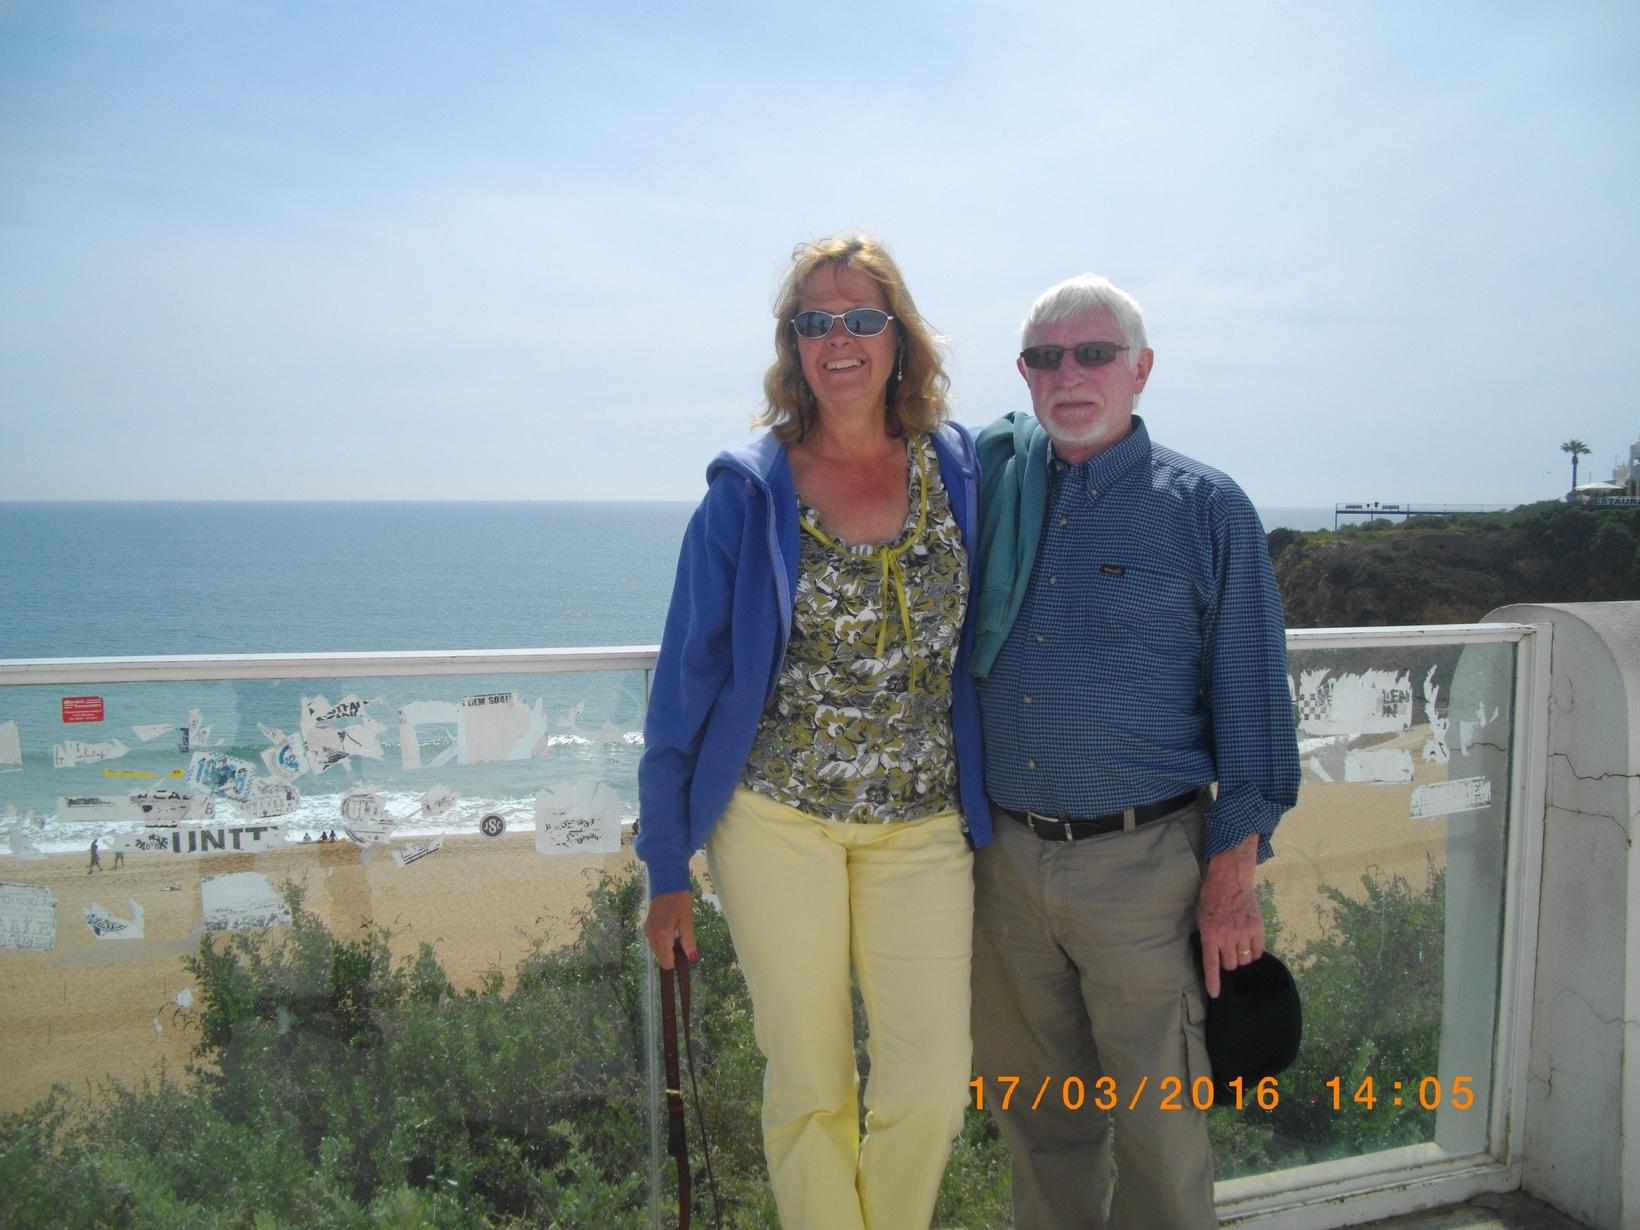 Mary & David from Markfield, United Kingdom